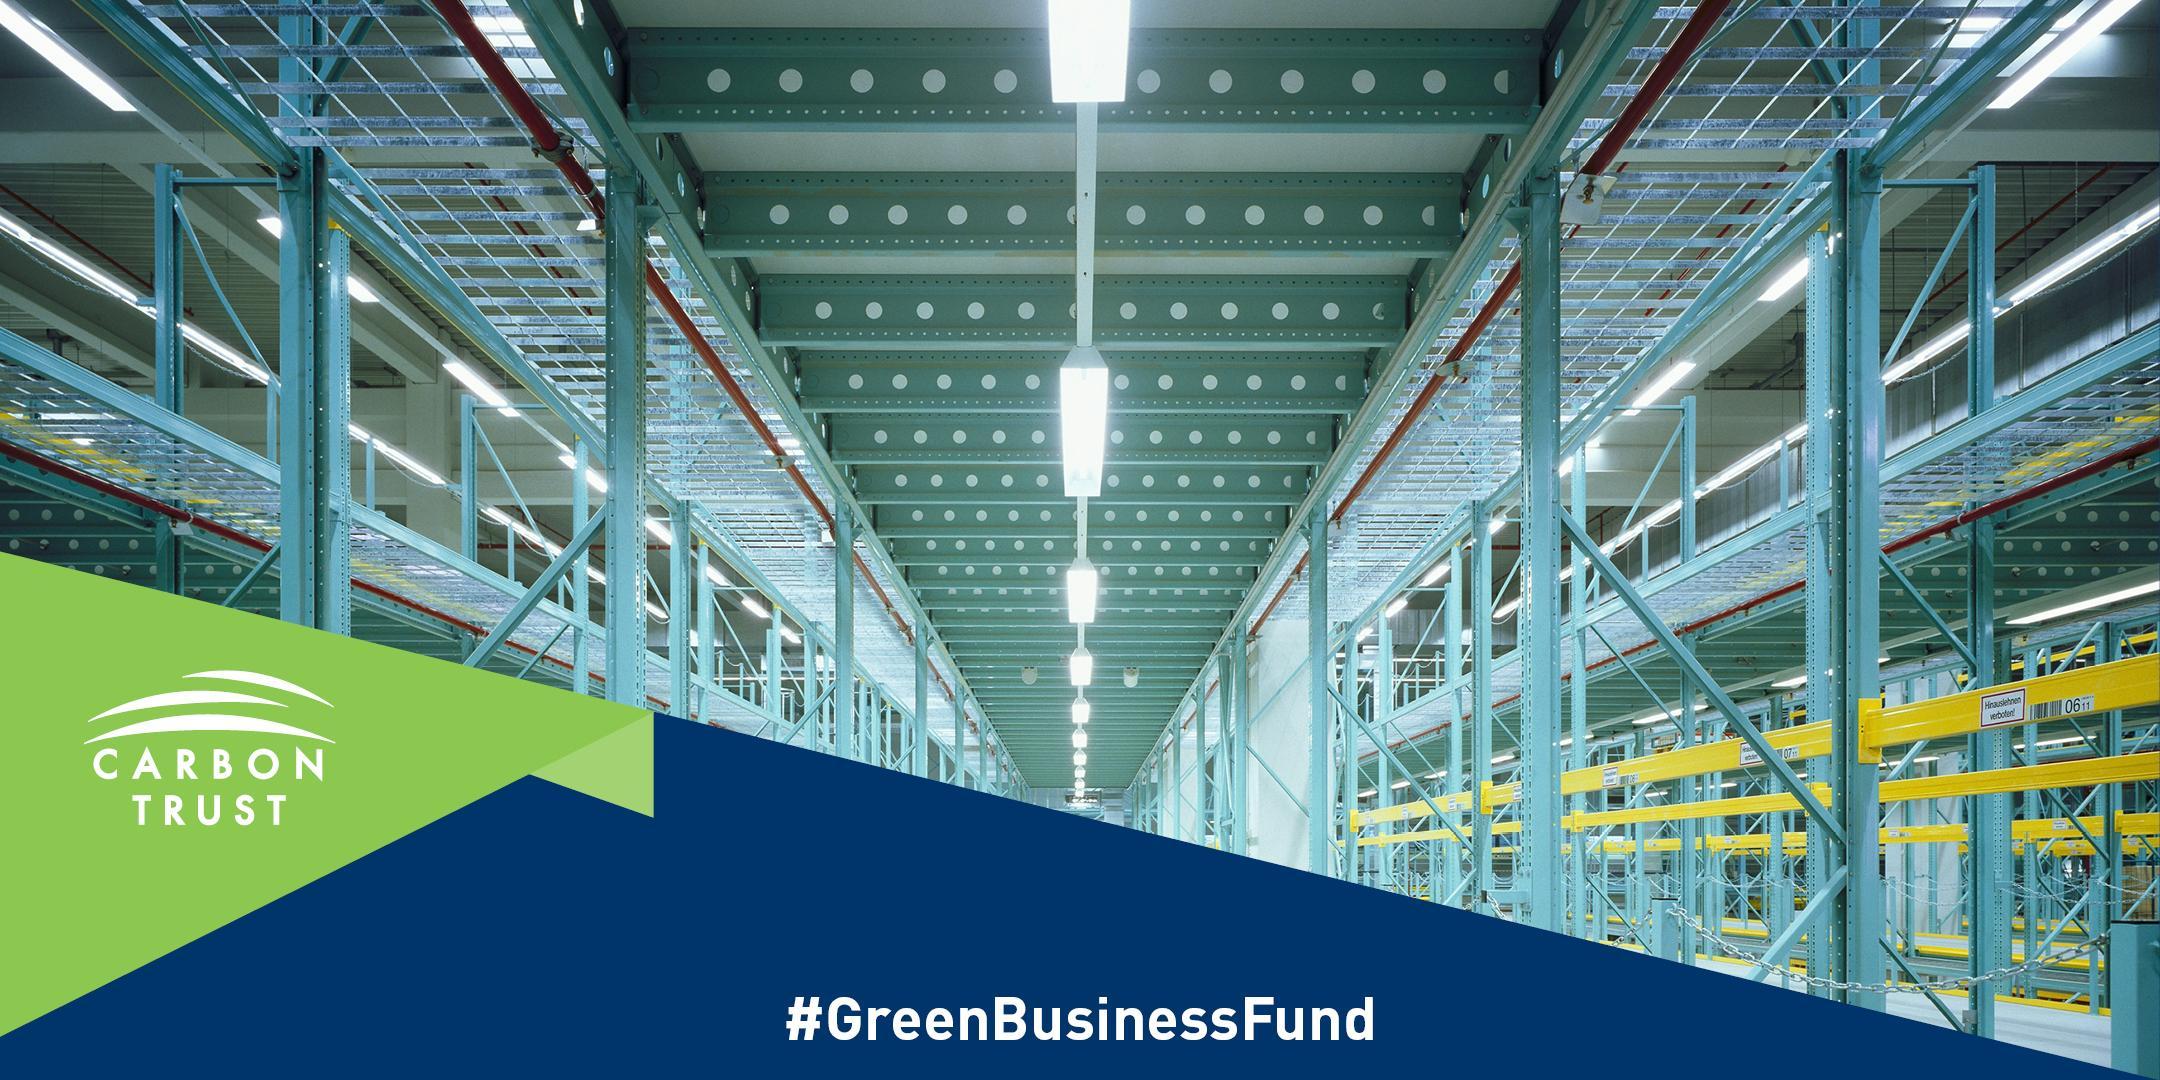 Green Business Fund workshop (Nottingham) - A